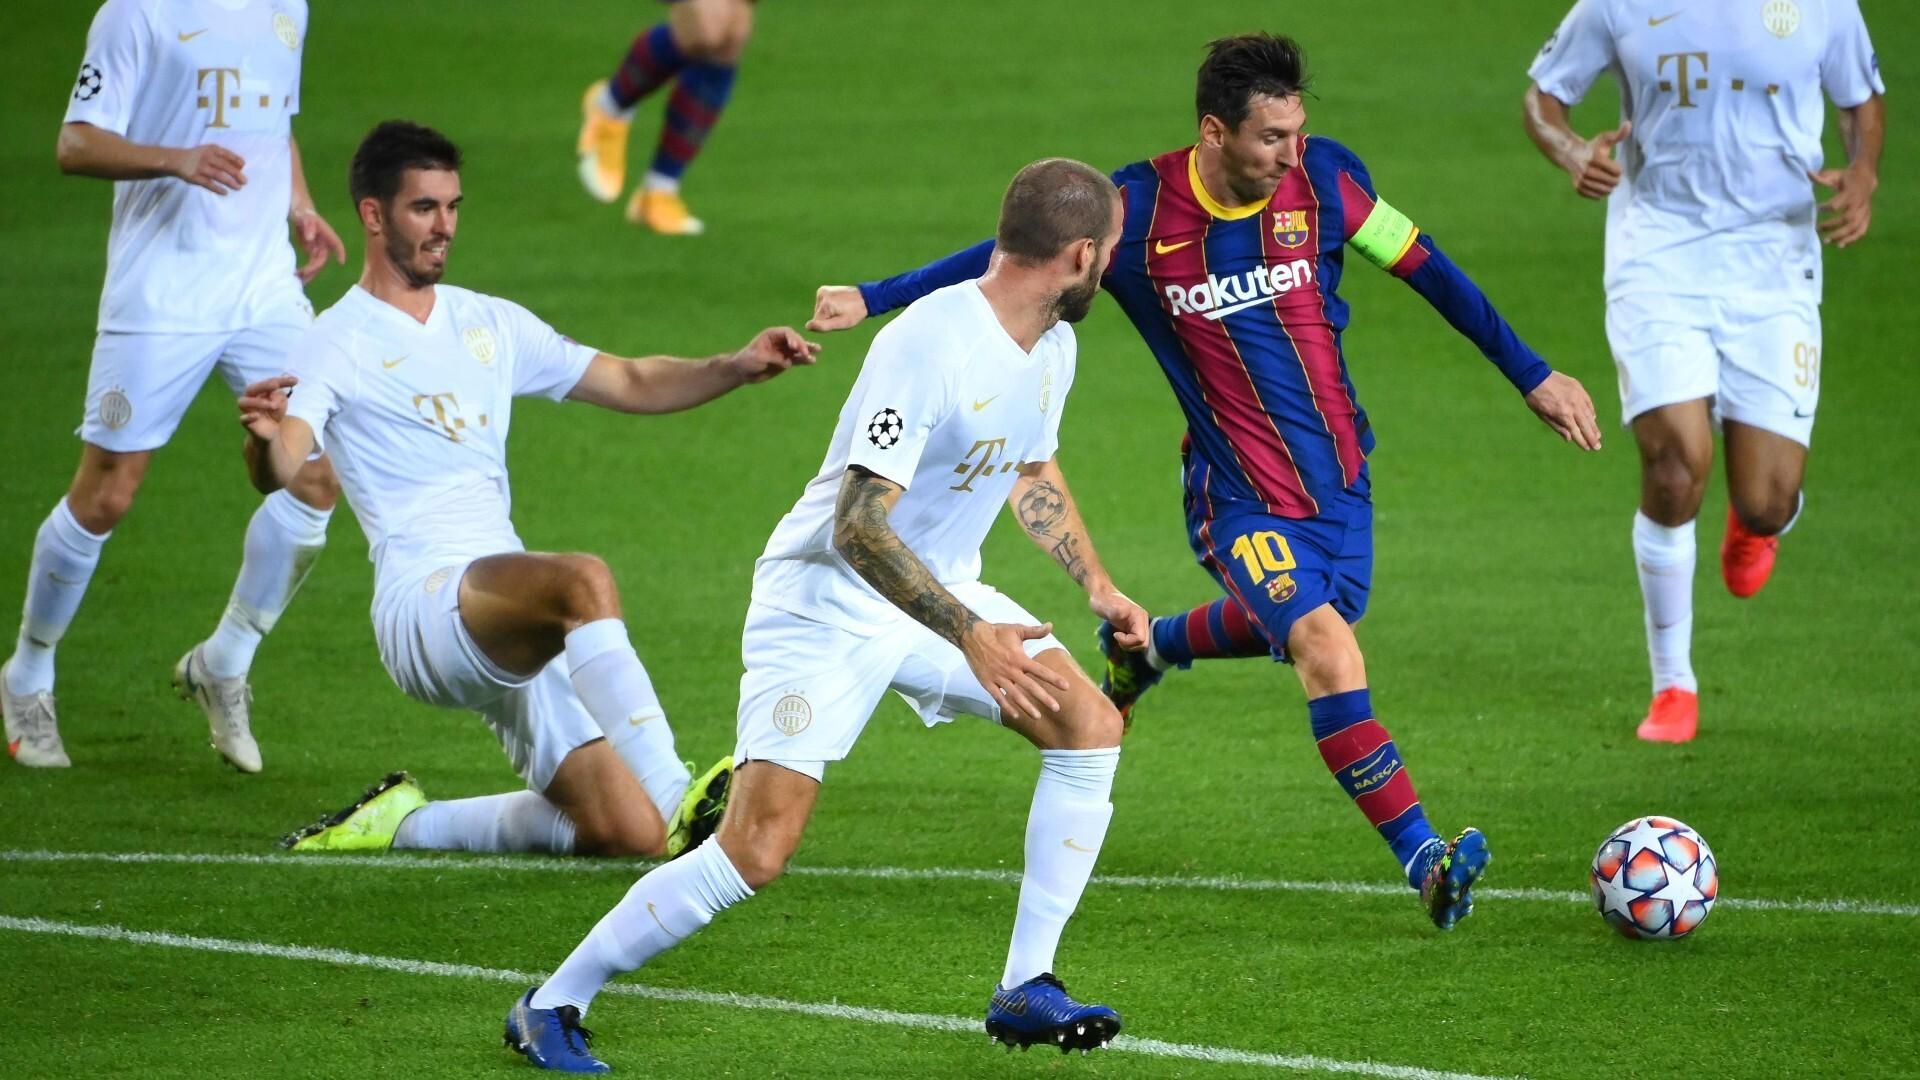 El Barcelona vs Ferencváros por la Champions League